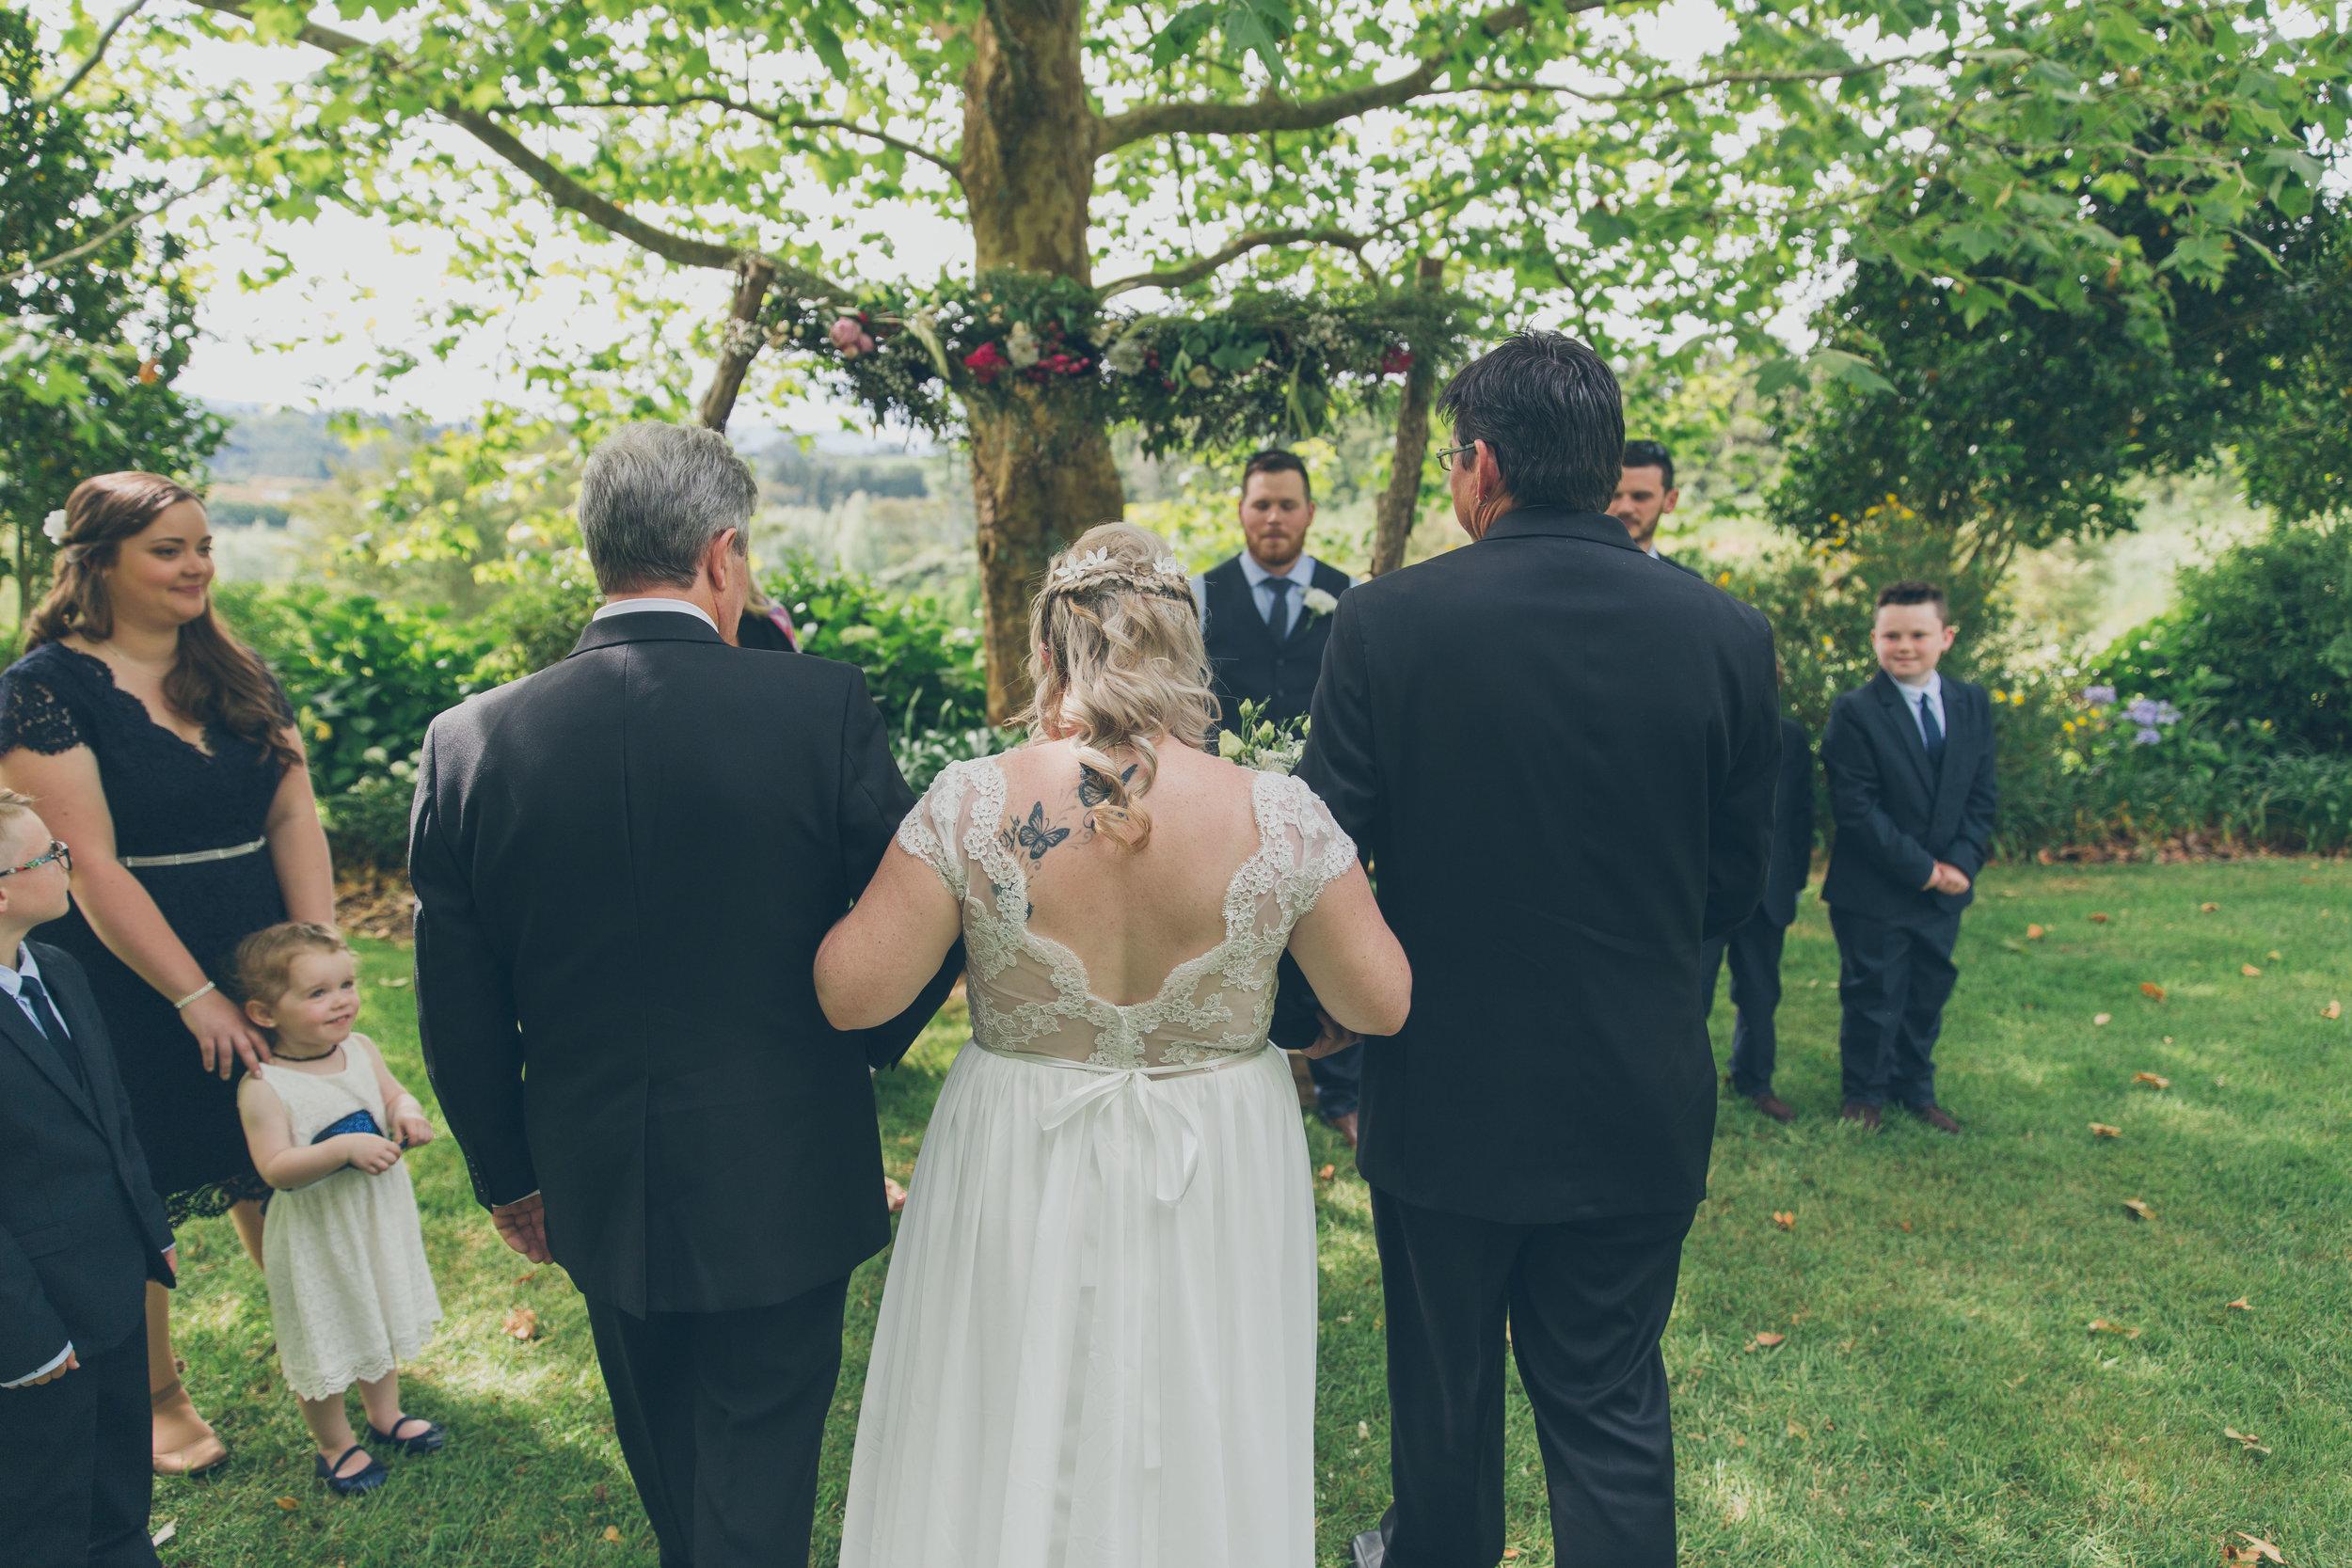 K & S - Wedding - Oh Joy! Photography - Tauranga, New Zealand-1.jpg